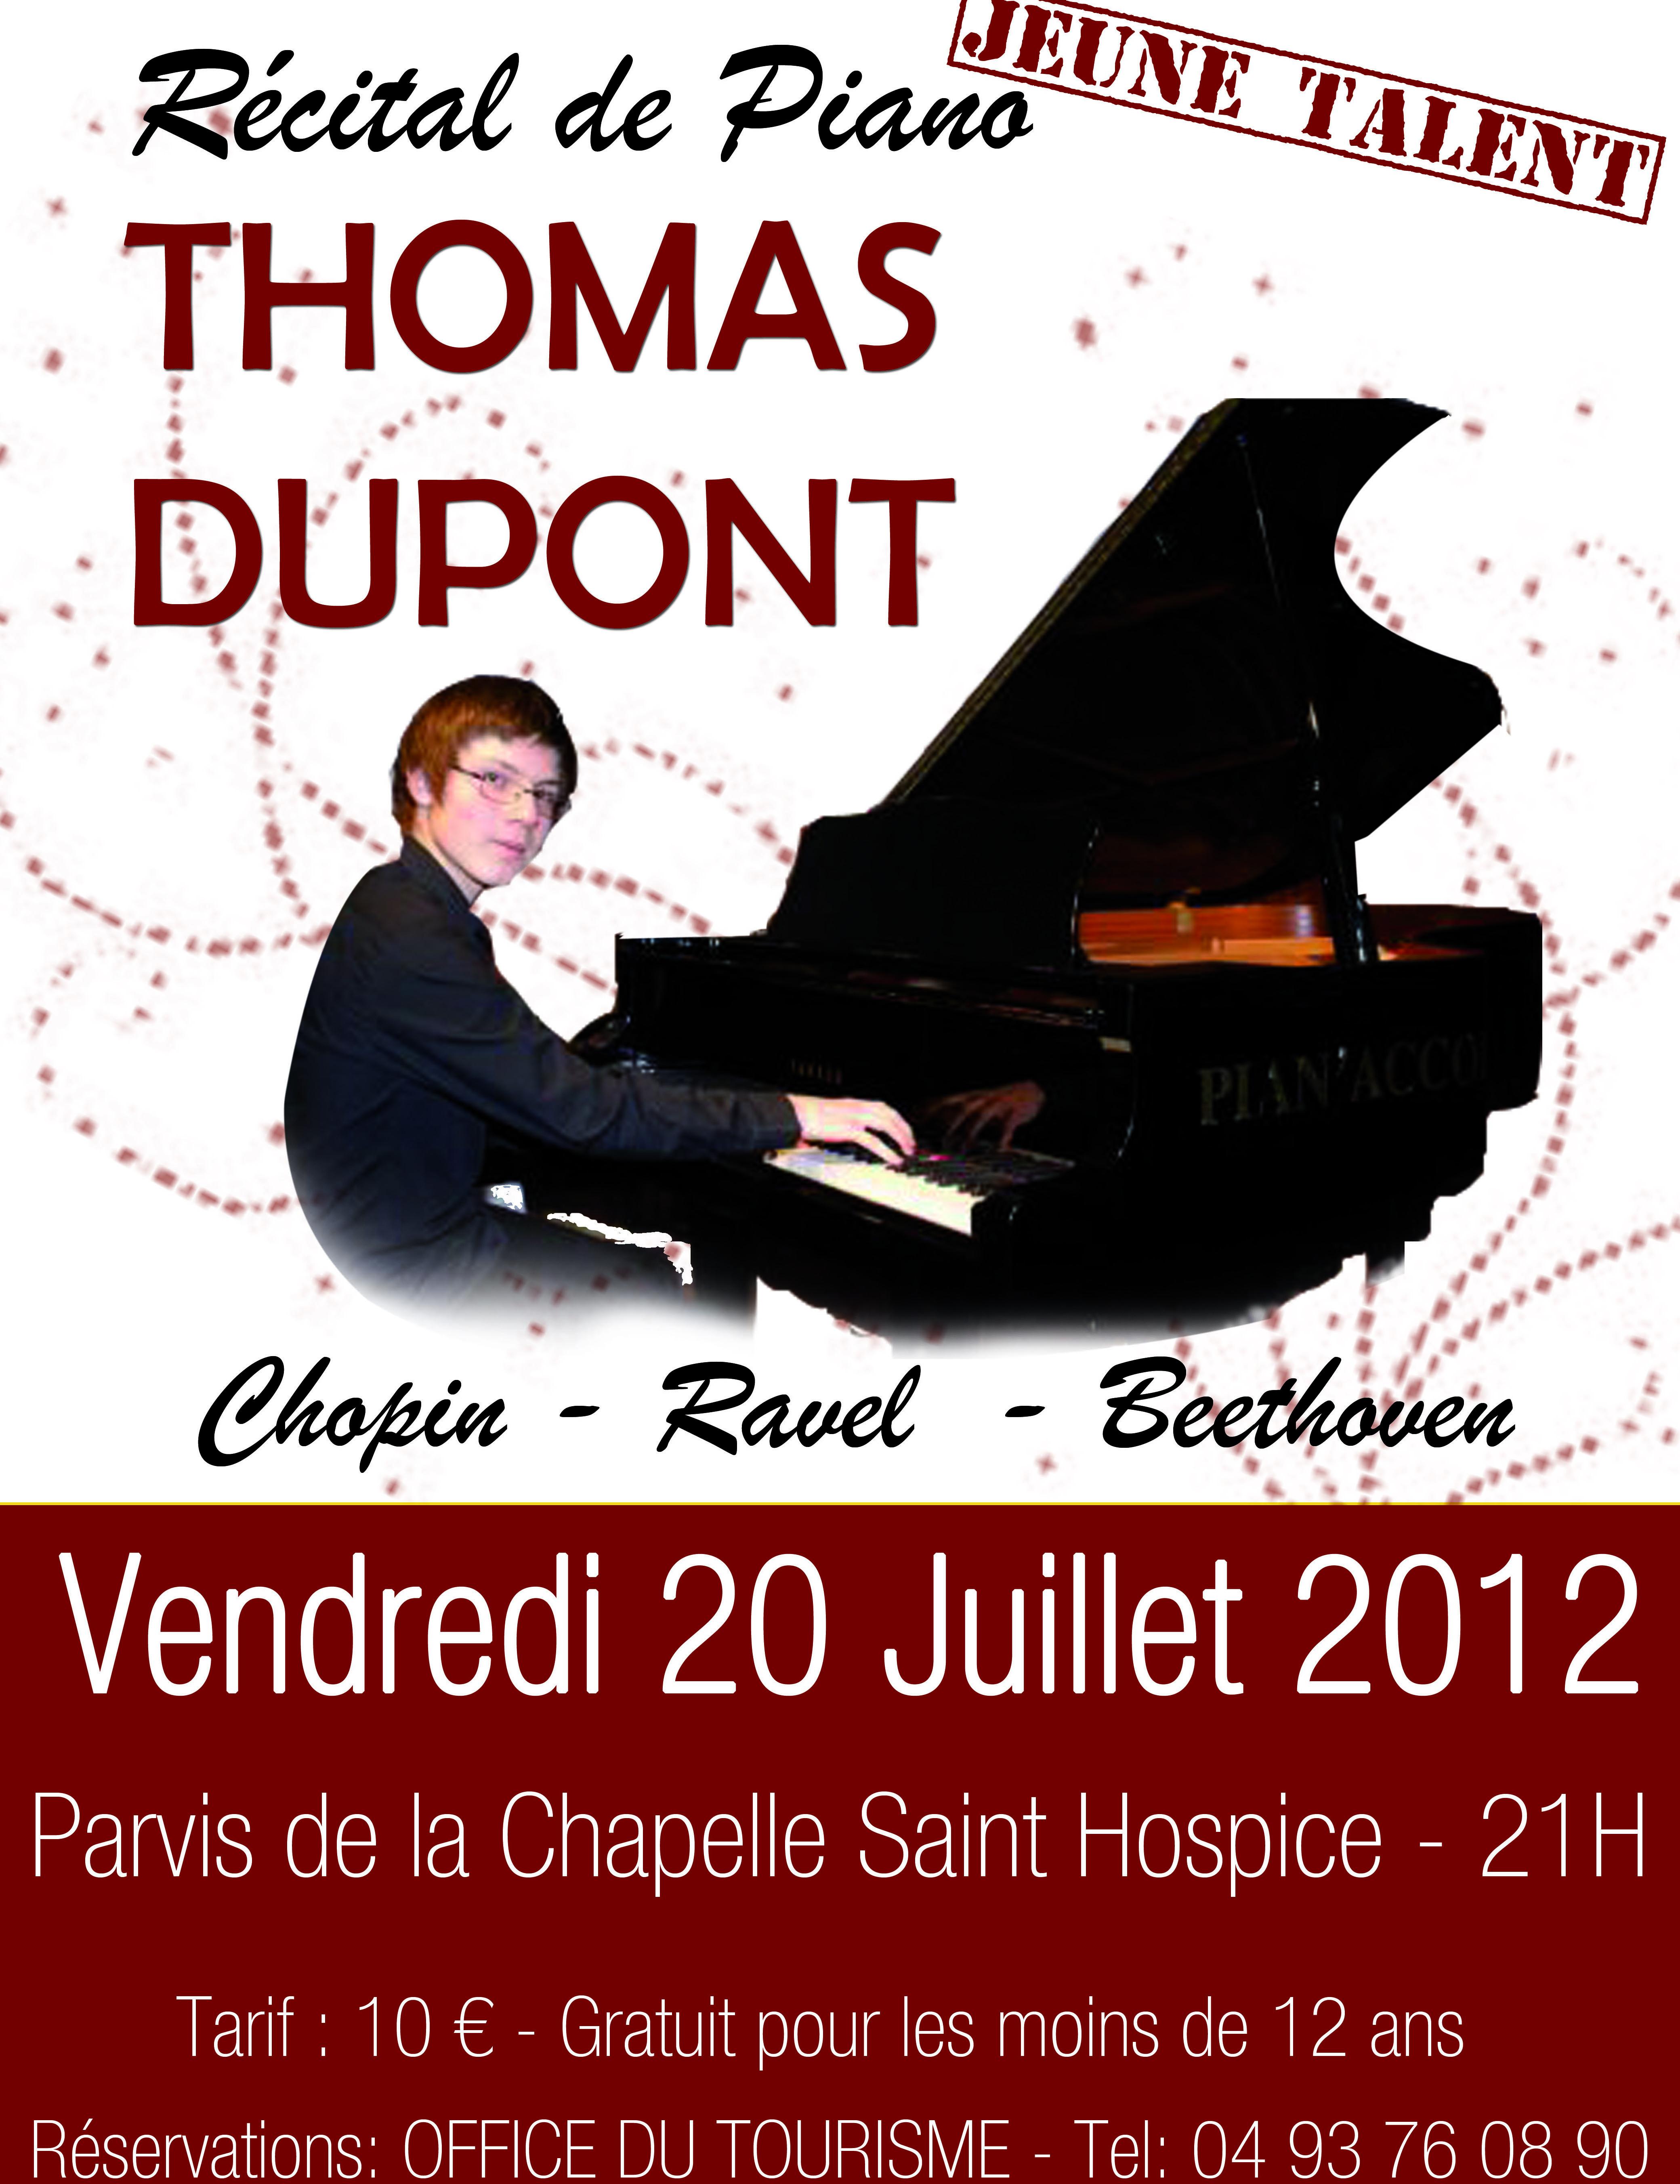 RÉCITAL DE PIANO THOMAS DUPONT